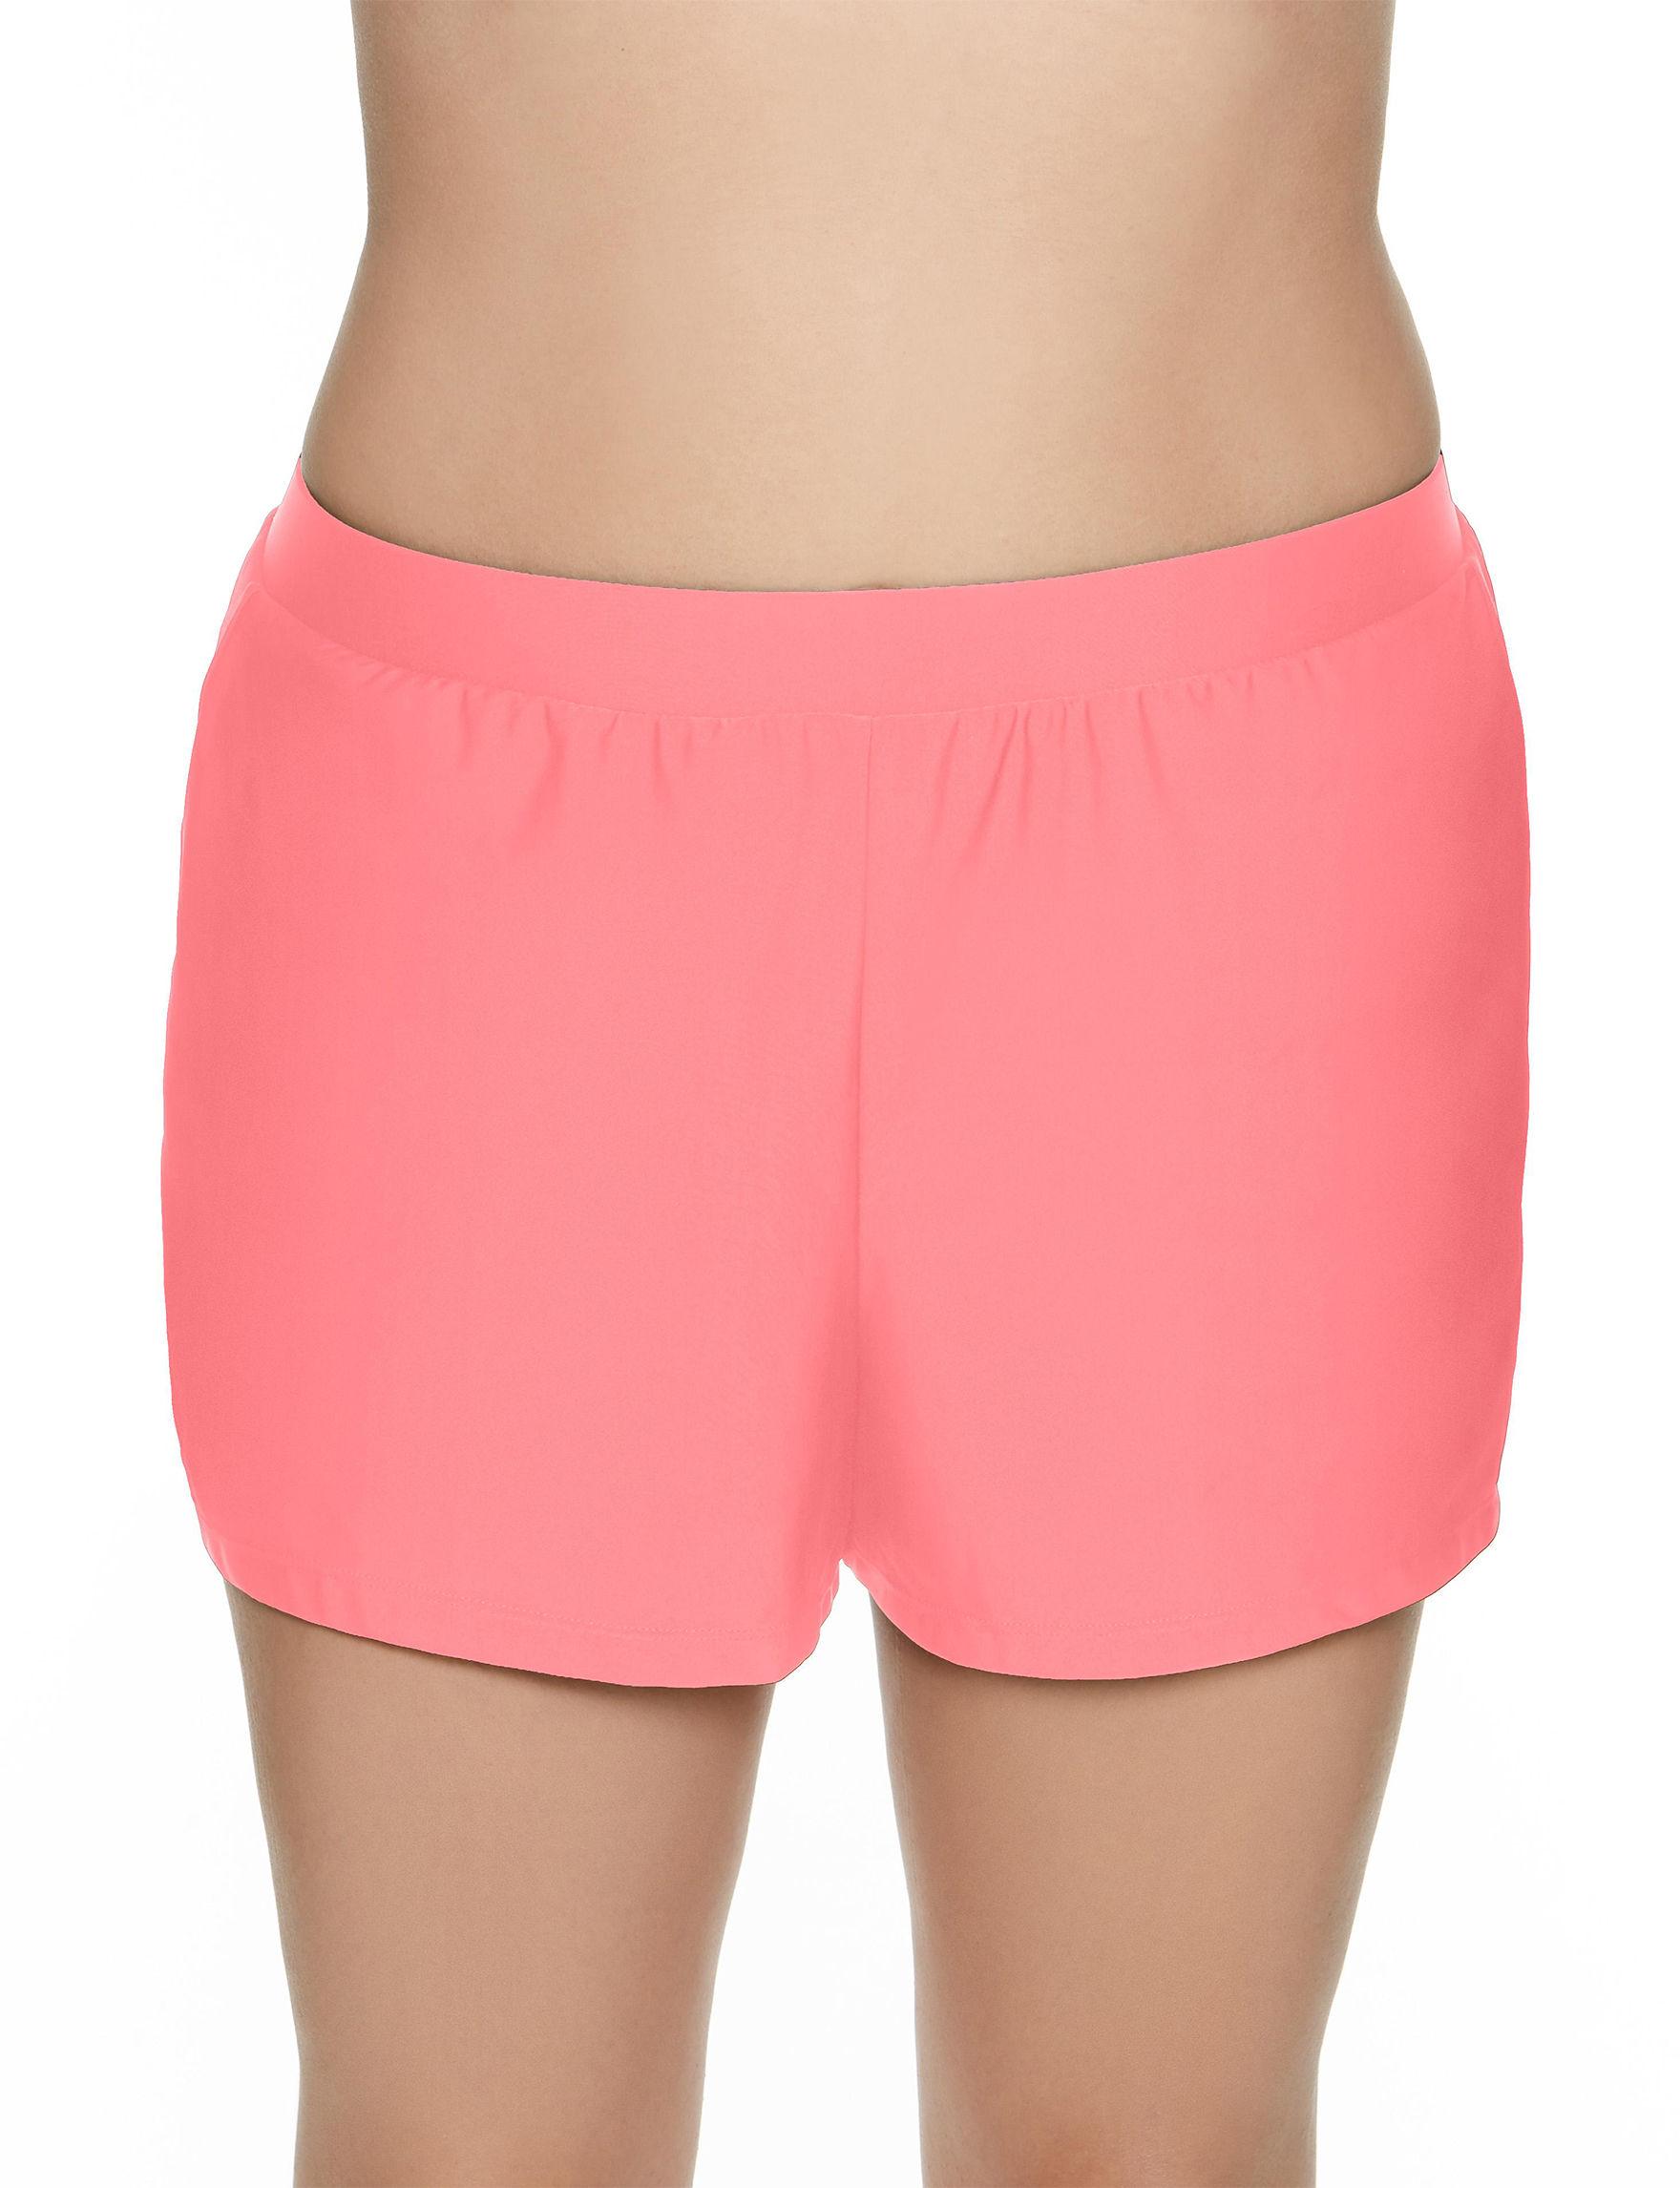 Beach Diva Coral Swimsuit Bottoms Boyshort